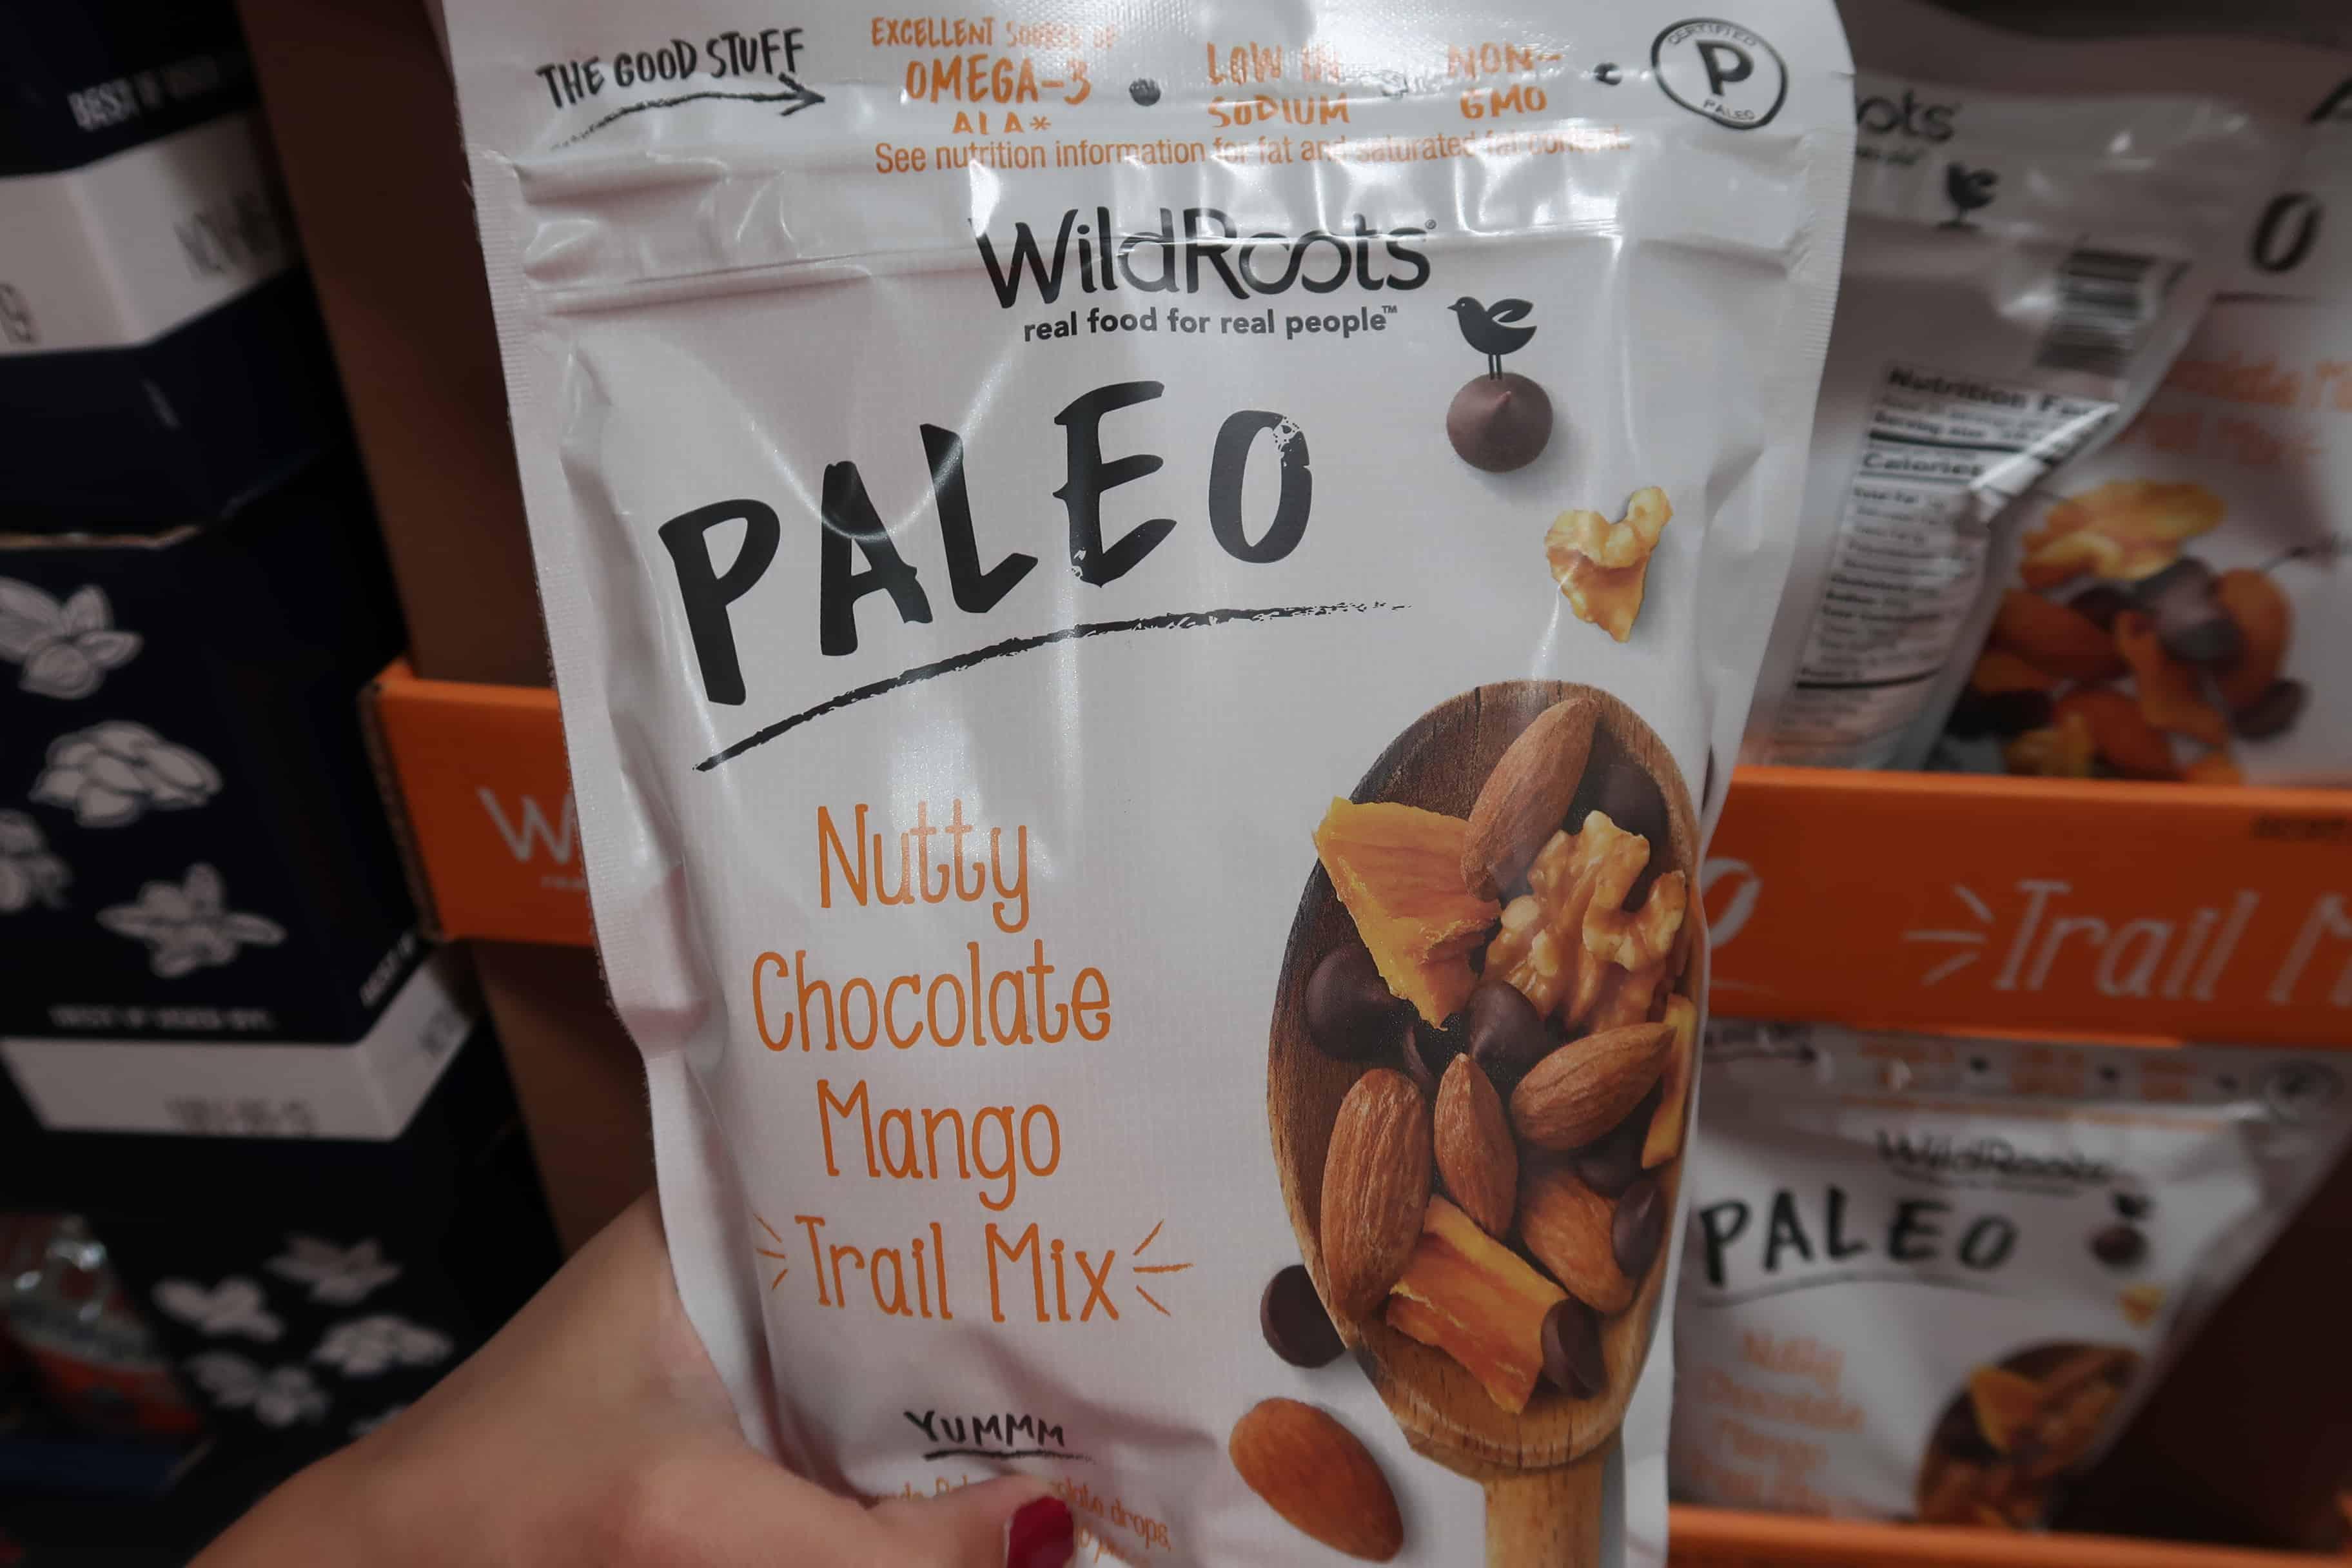 paleo trail mix at costco